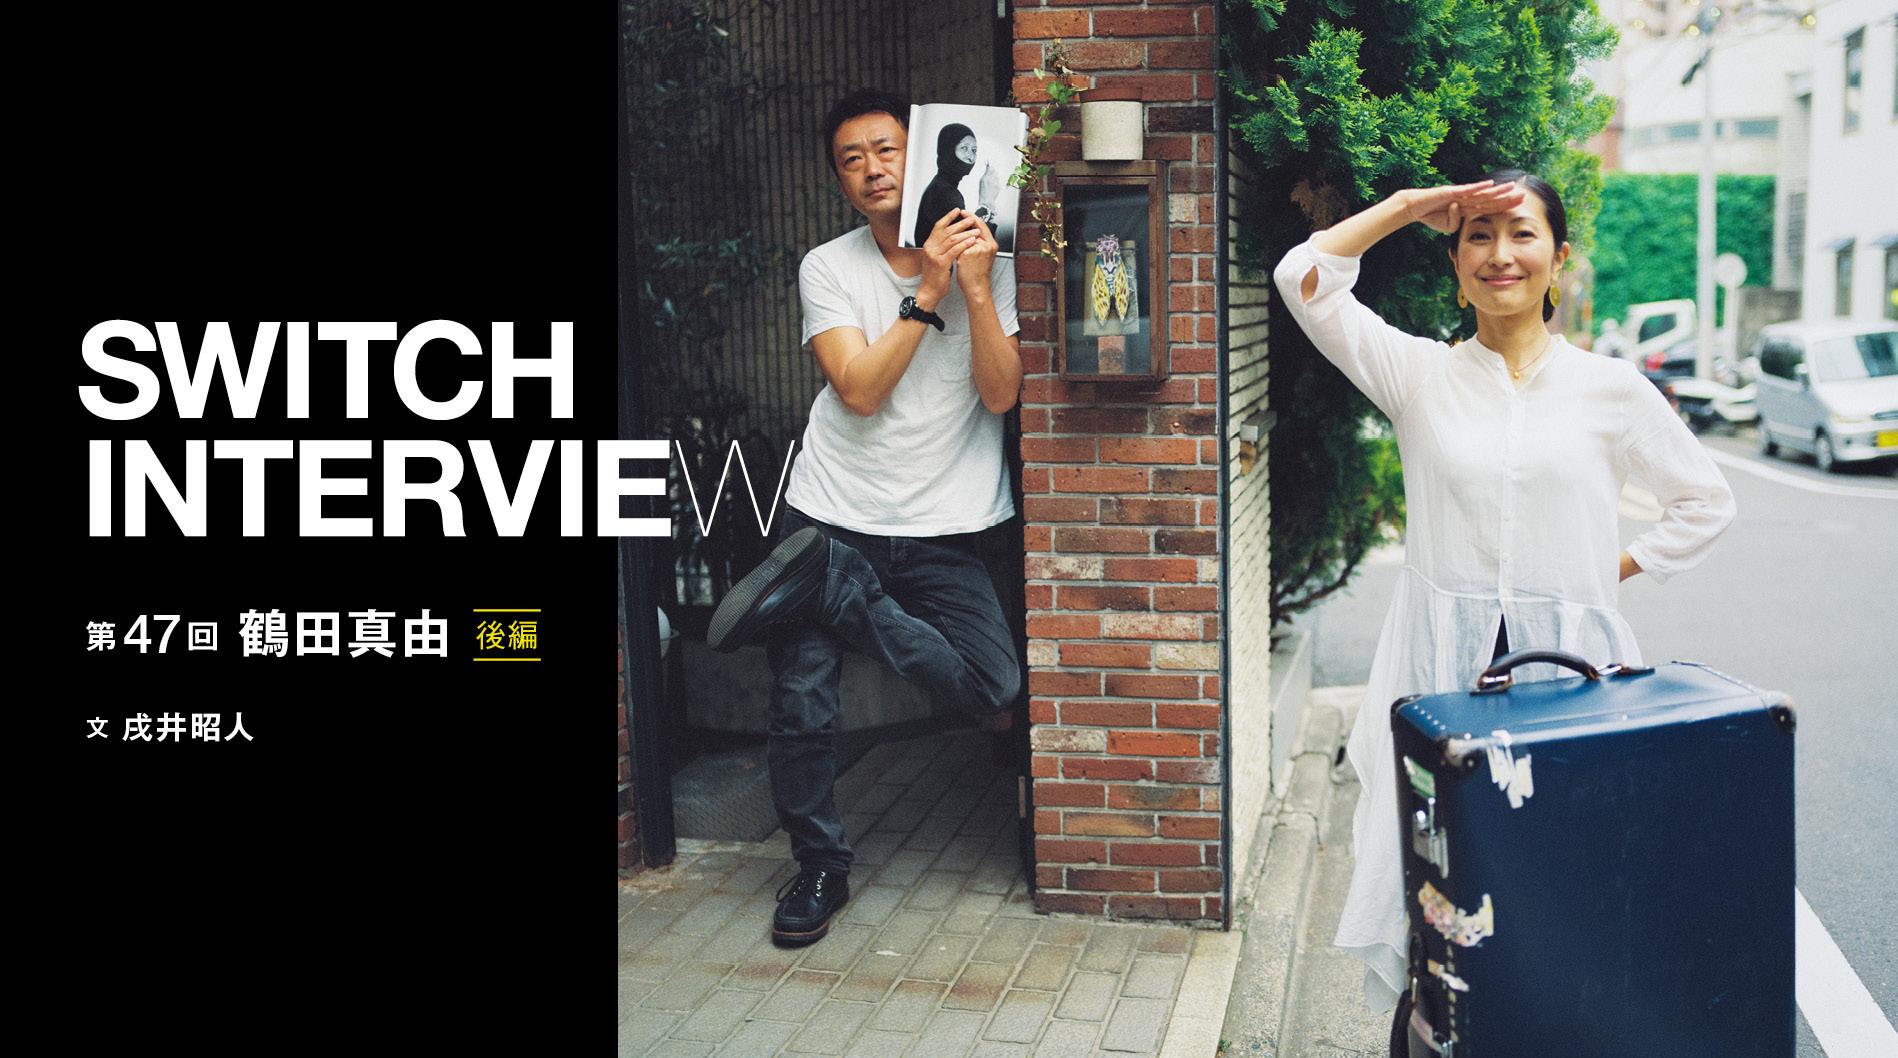 ac4977110378ee SWITCH INTERVIEW ――鶴田真由「この世は、霧に映写された映像みたい」 後編